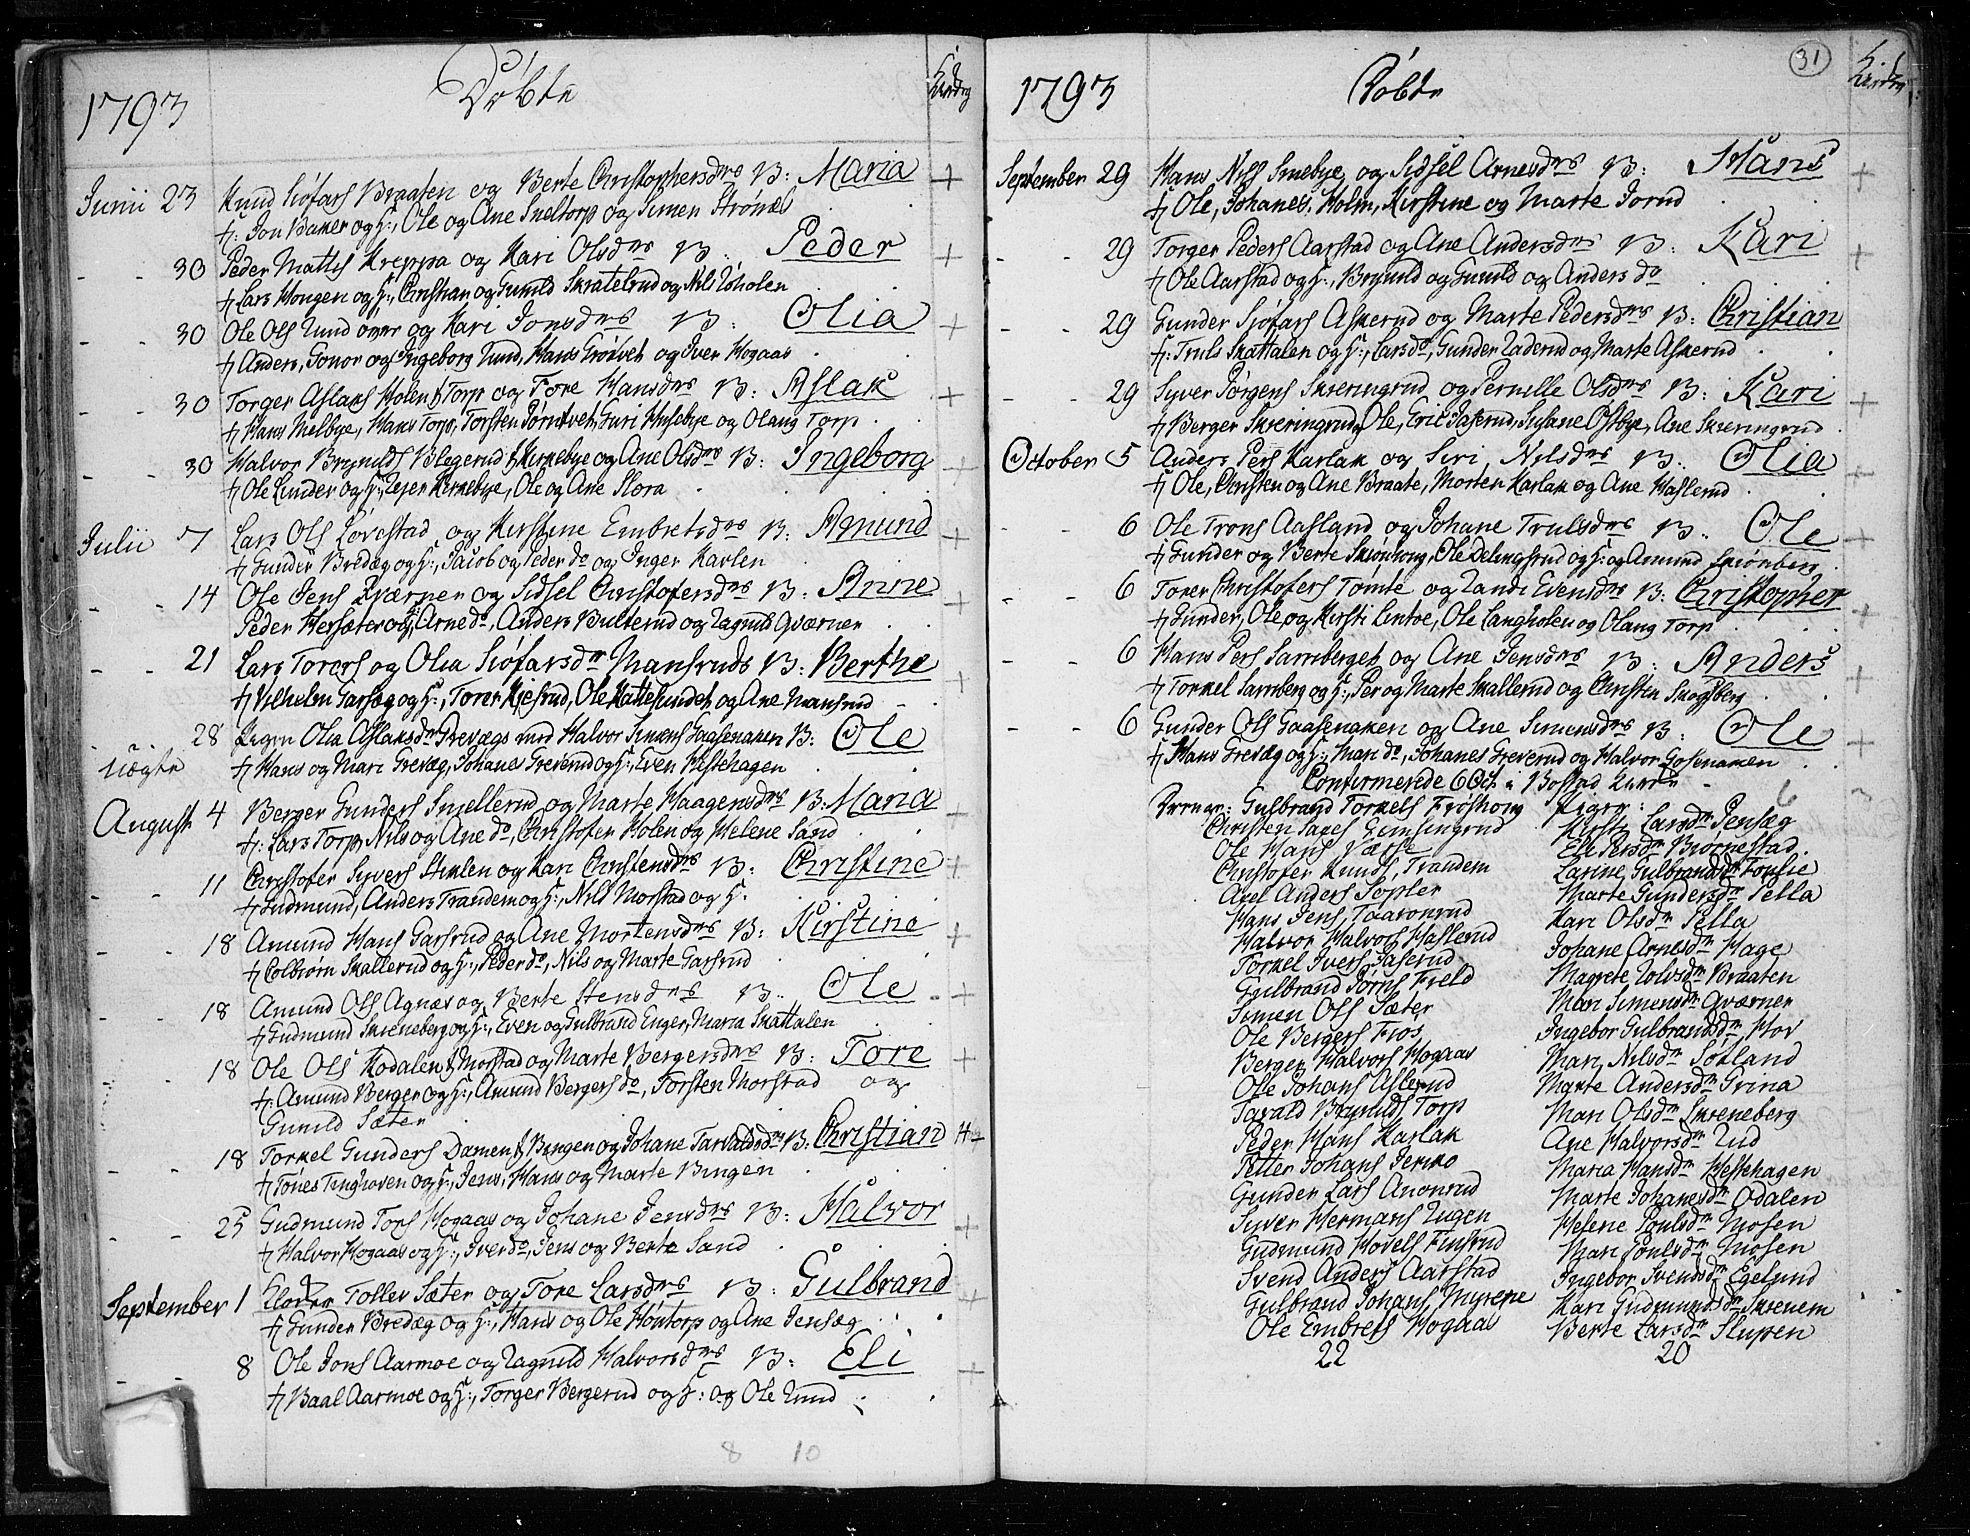 SAO, Trøgstad prestekontor Kirkebøker, F/Fa/L0005: Ministerialbok nr. I 5, 1784-1814, s. 31